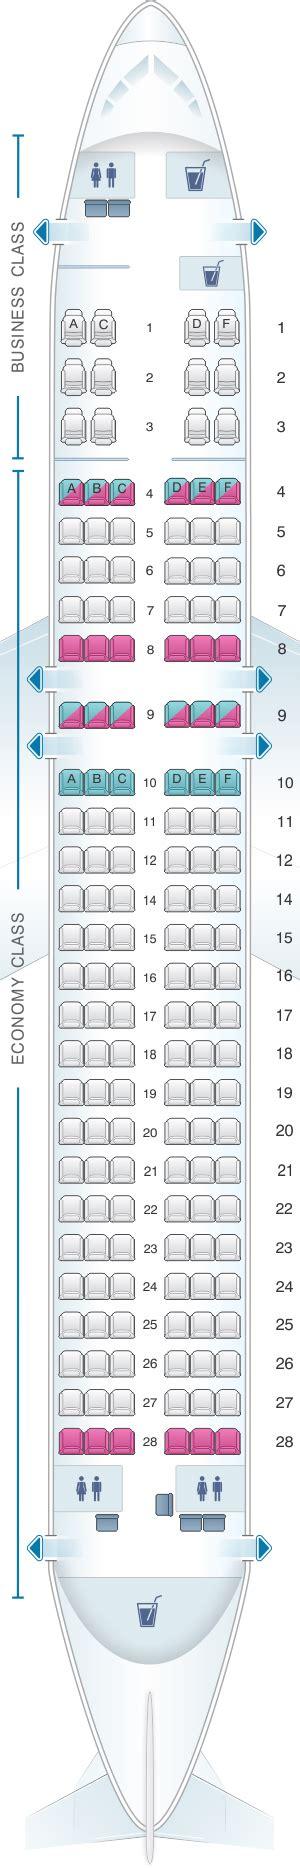 plan des sieges airbus a320 plan de cabine philippine airlines airbus a320 200 seatmaestro fr